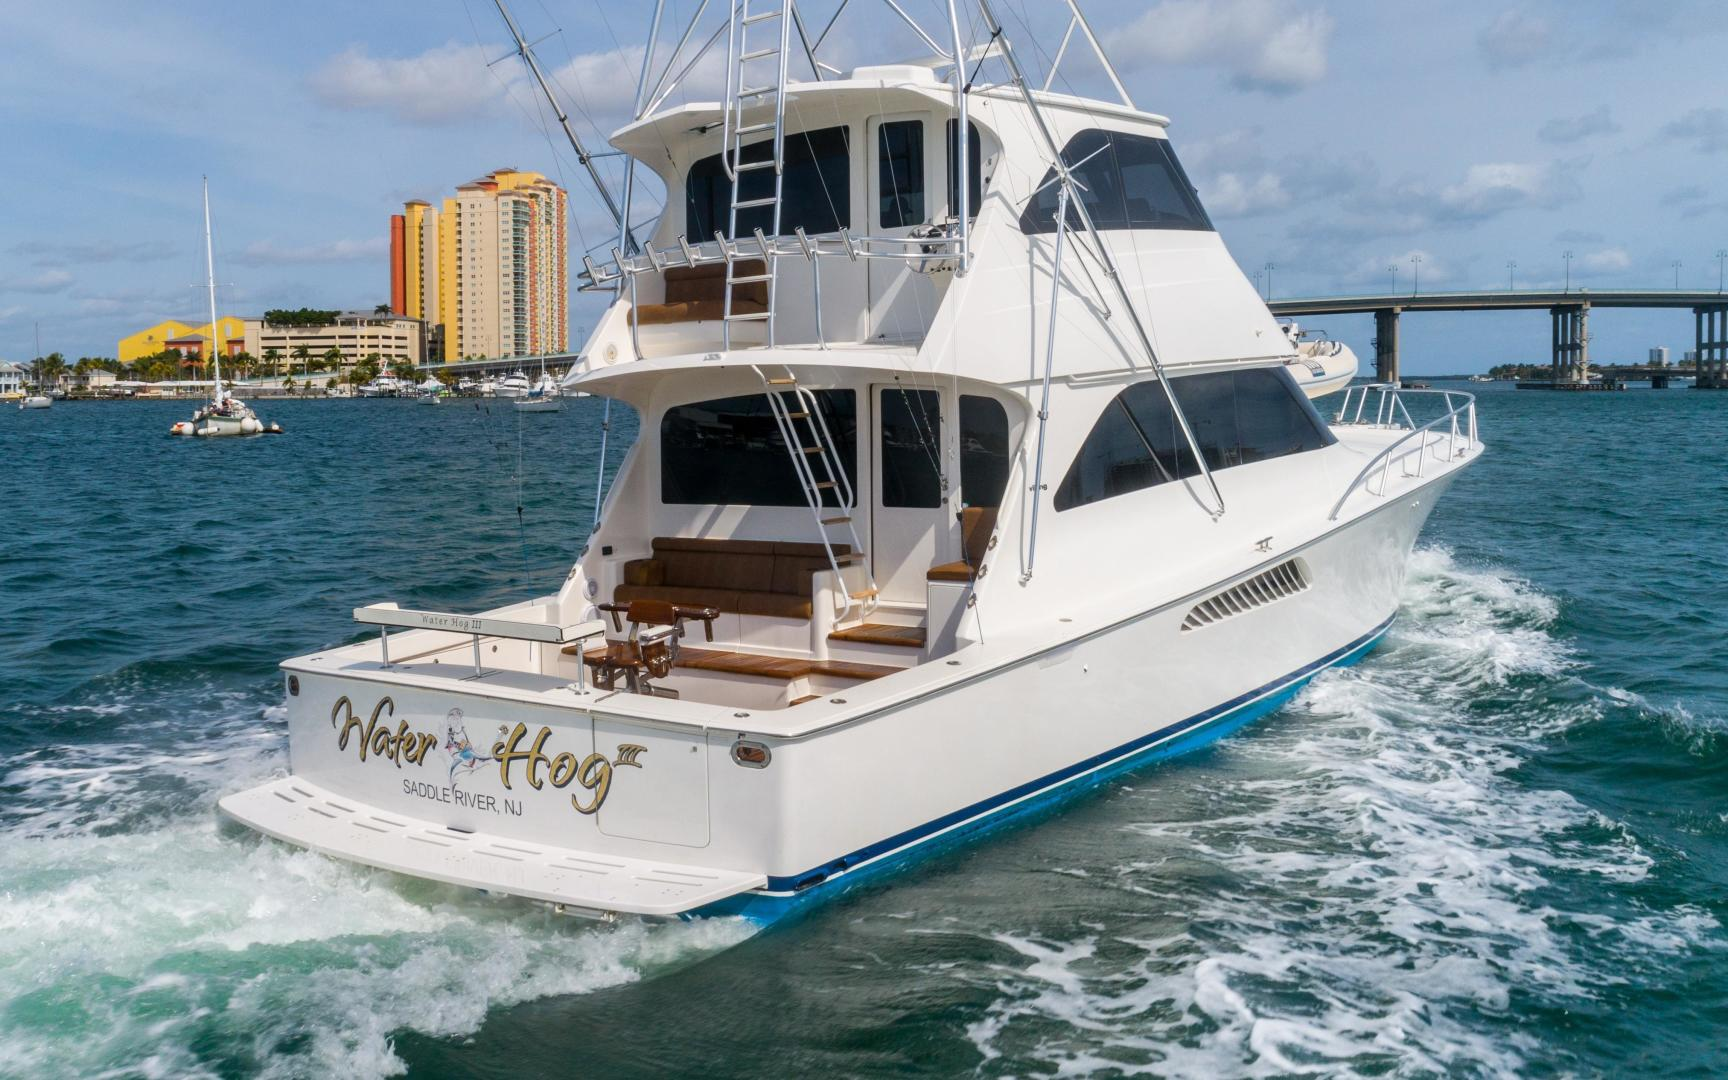 Viking 2008-WATER HOG III Fort Lauderdale-Florida-United States-1572381 | Thumbnail